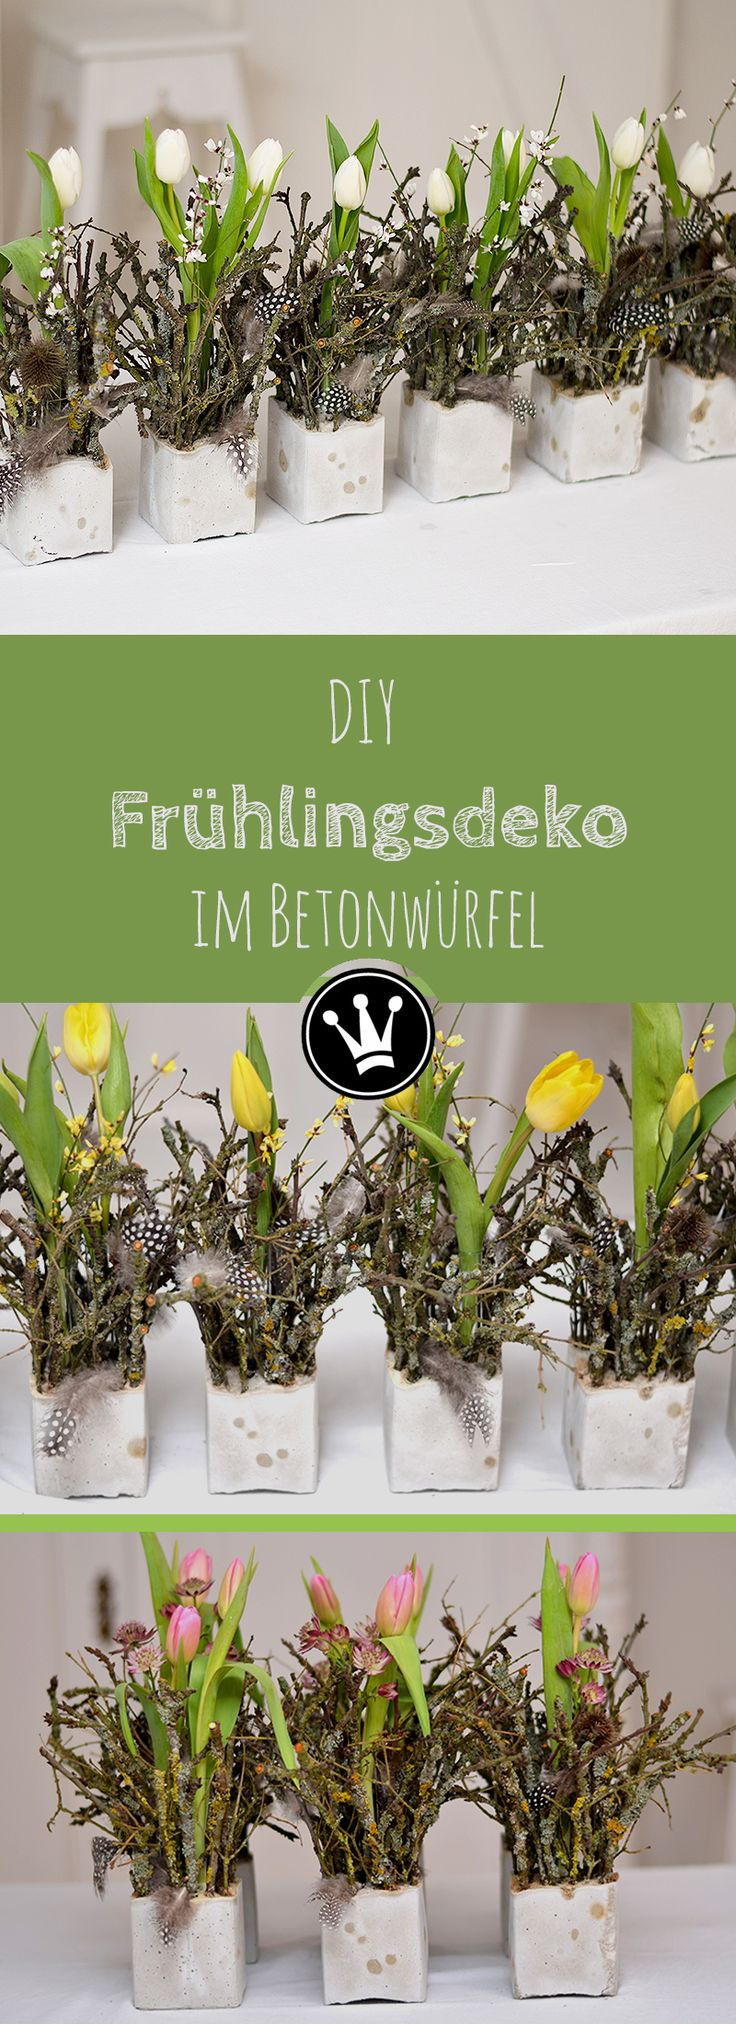 56 best DIY - Frühling und Ostern images on Pinterest